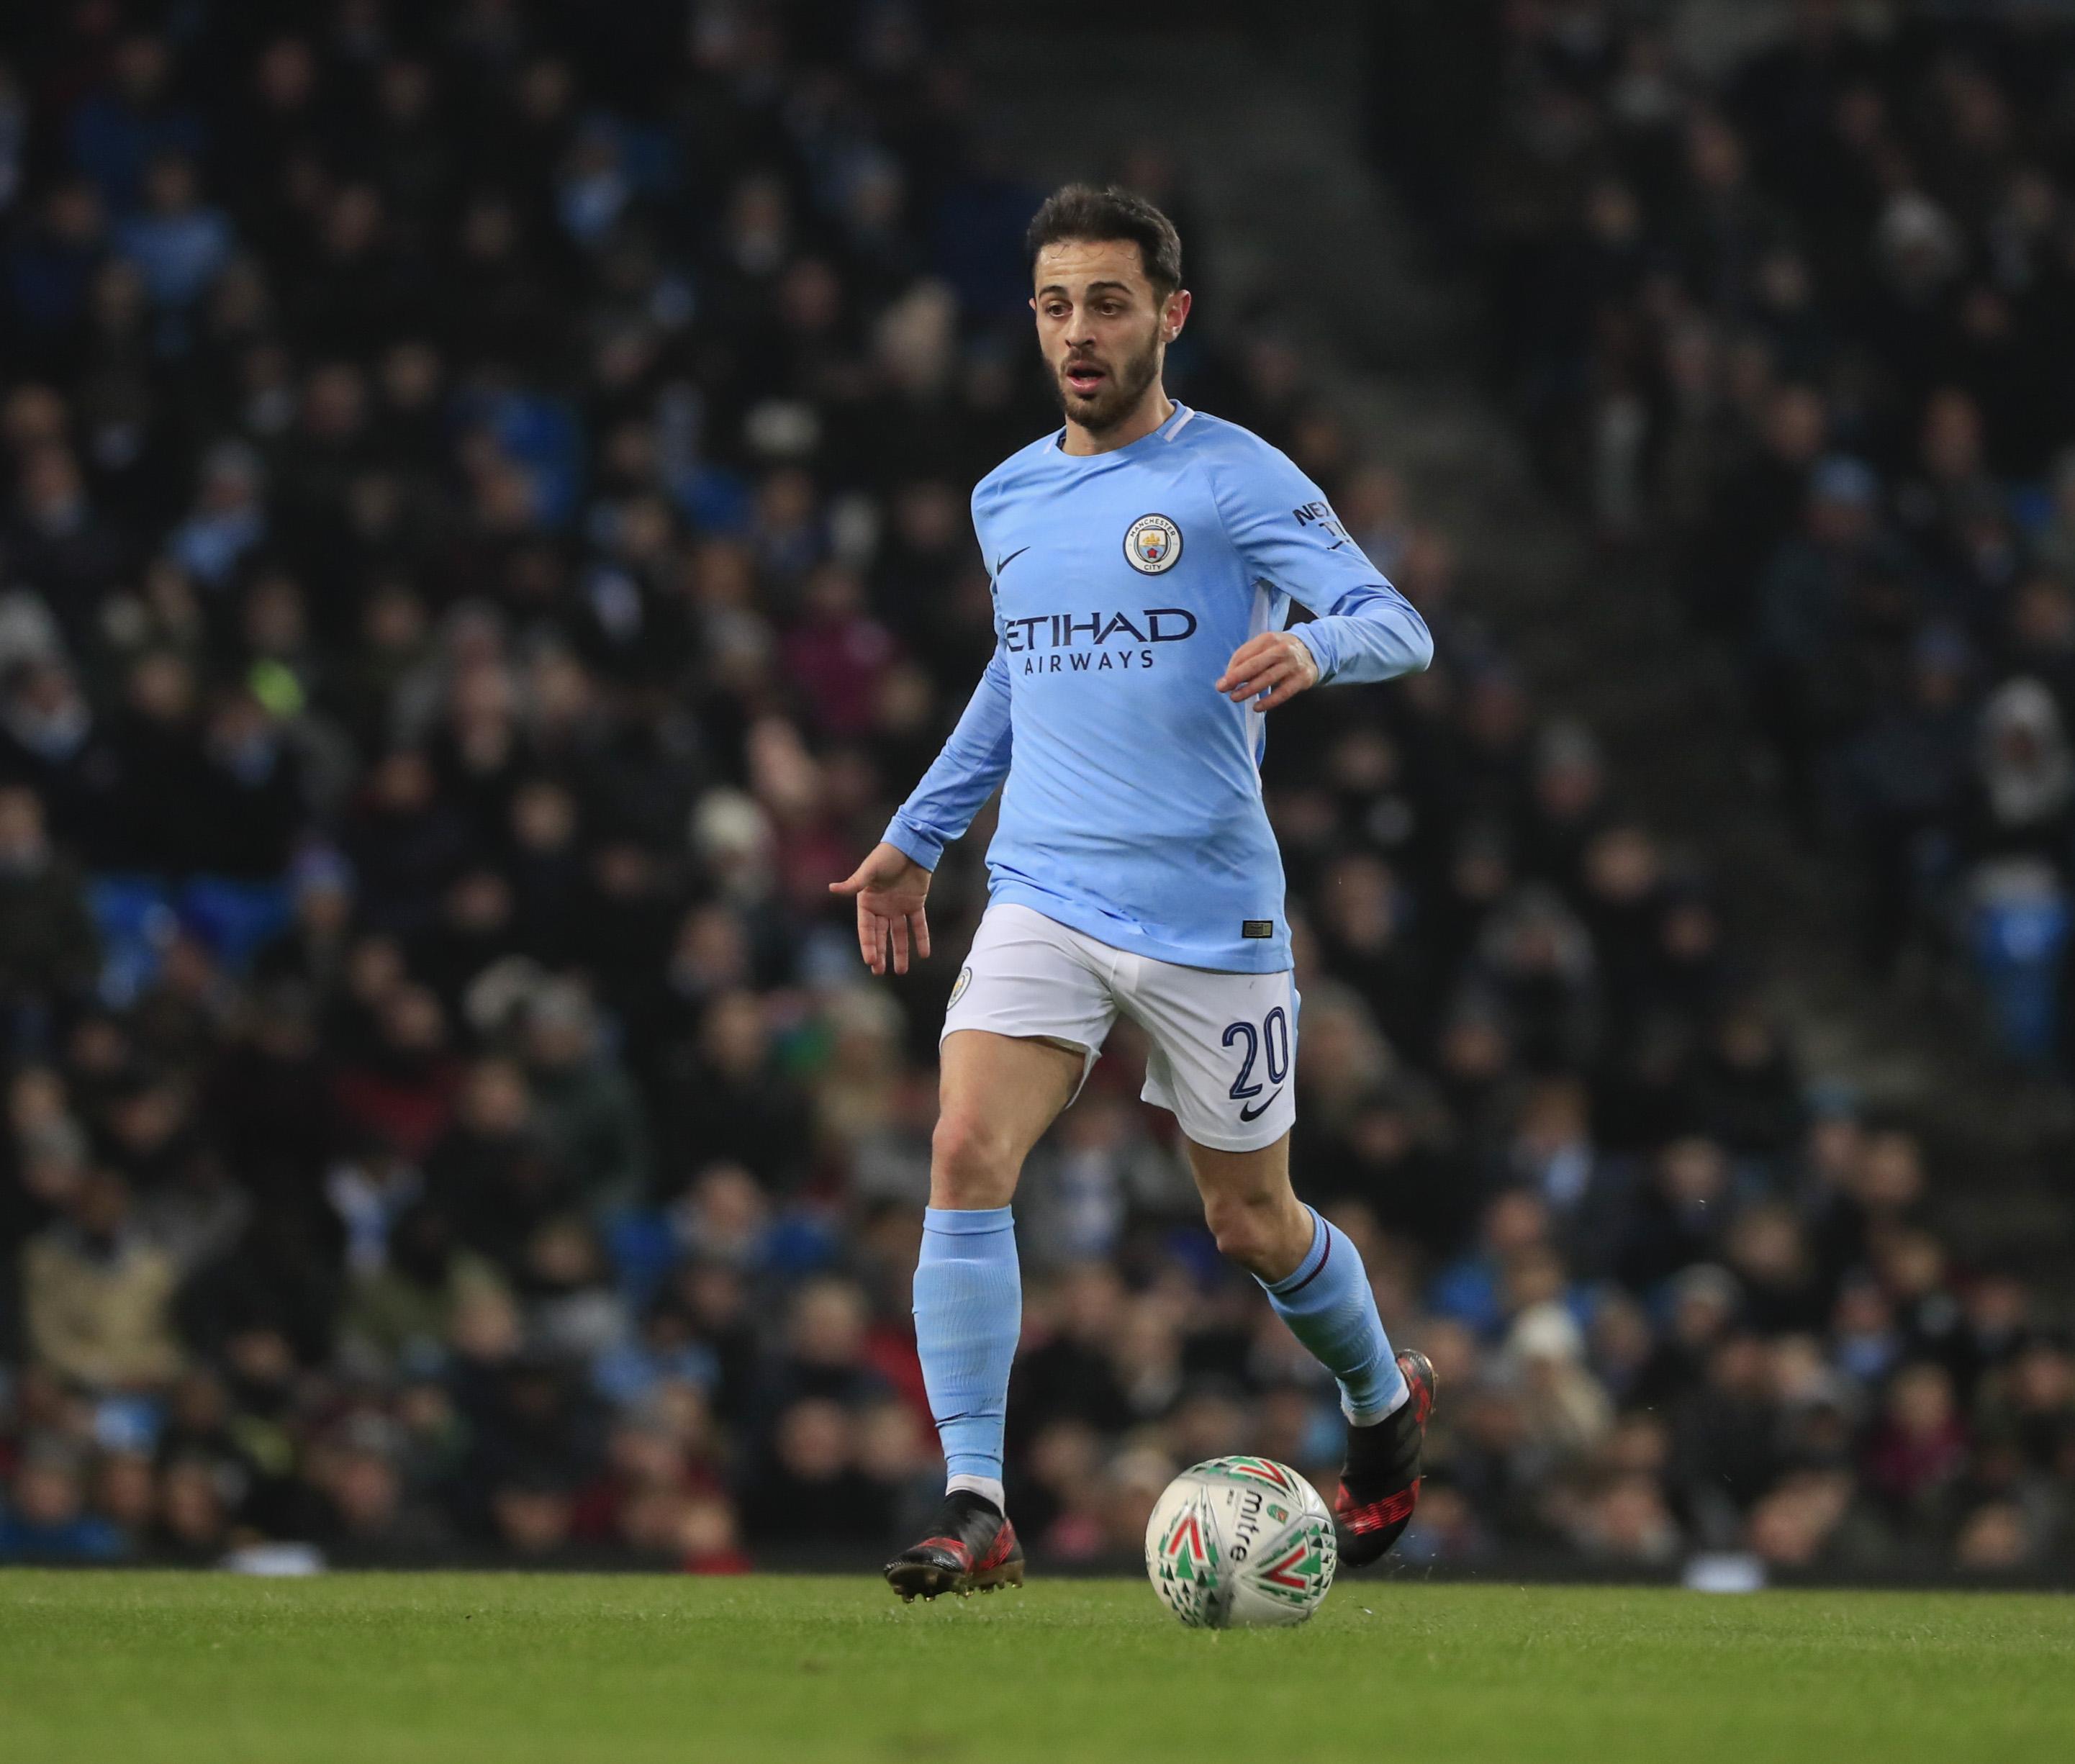 Football - Etranger - League Cup: Bristol-Manchester City en direct